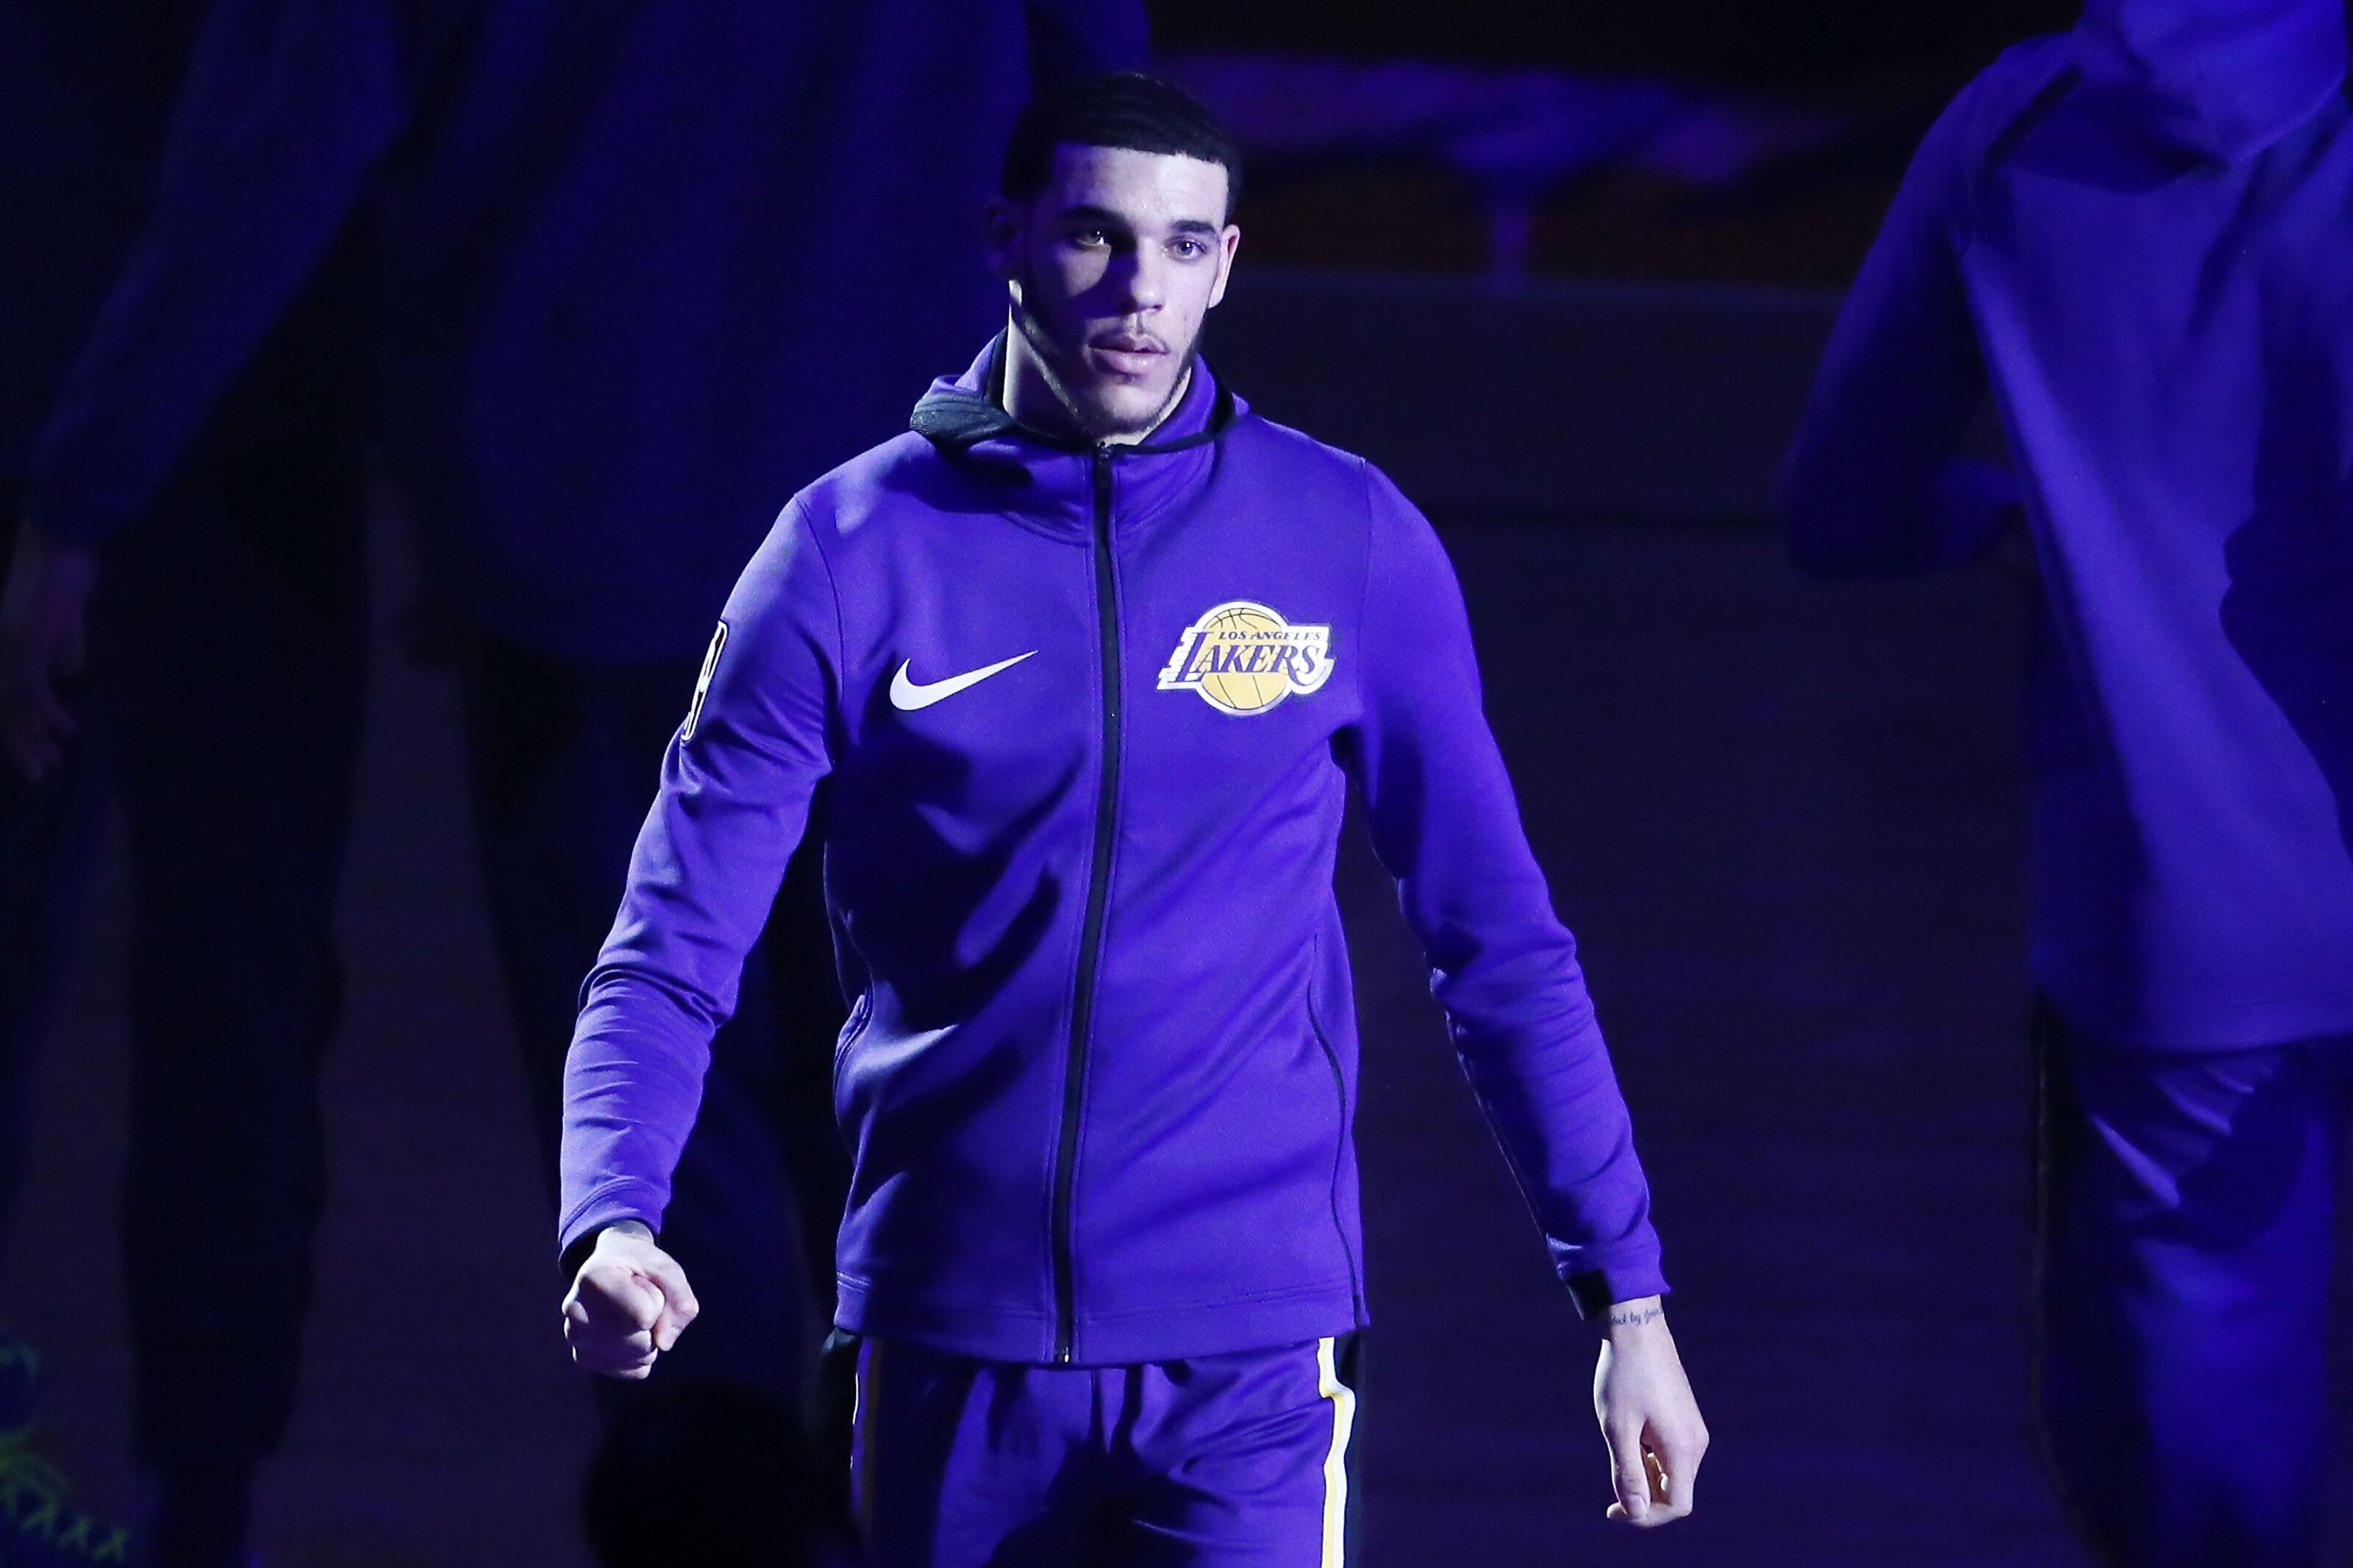 Chicago Bulls: Lonzo Ball vs. 2019 NBA Draft prospects